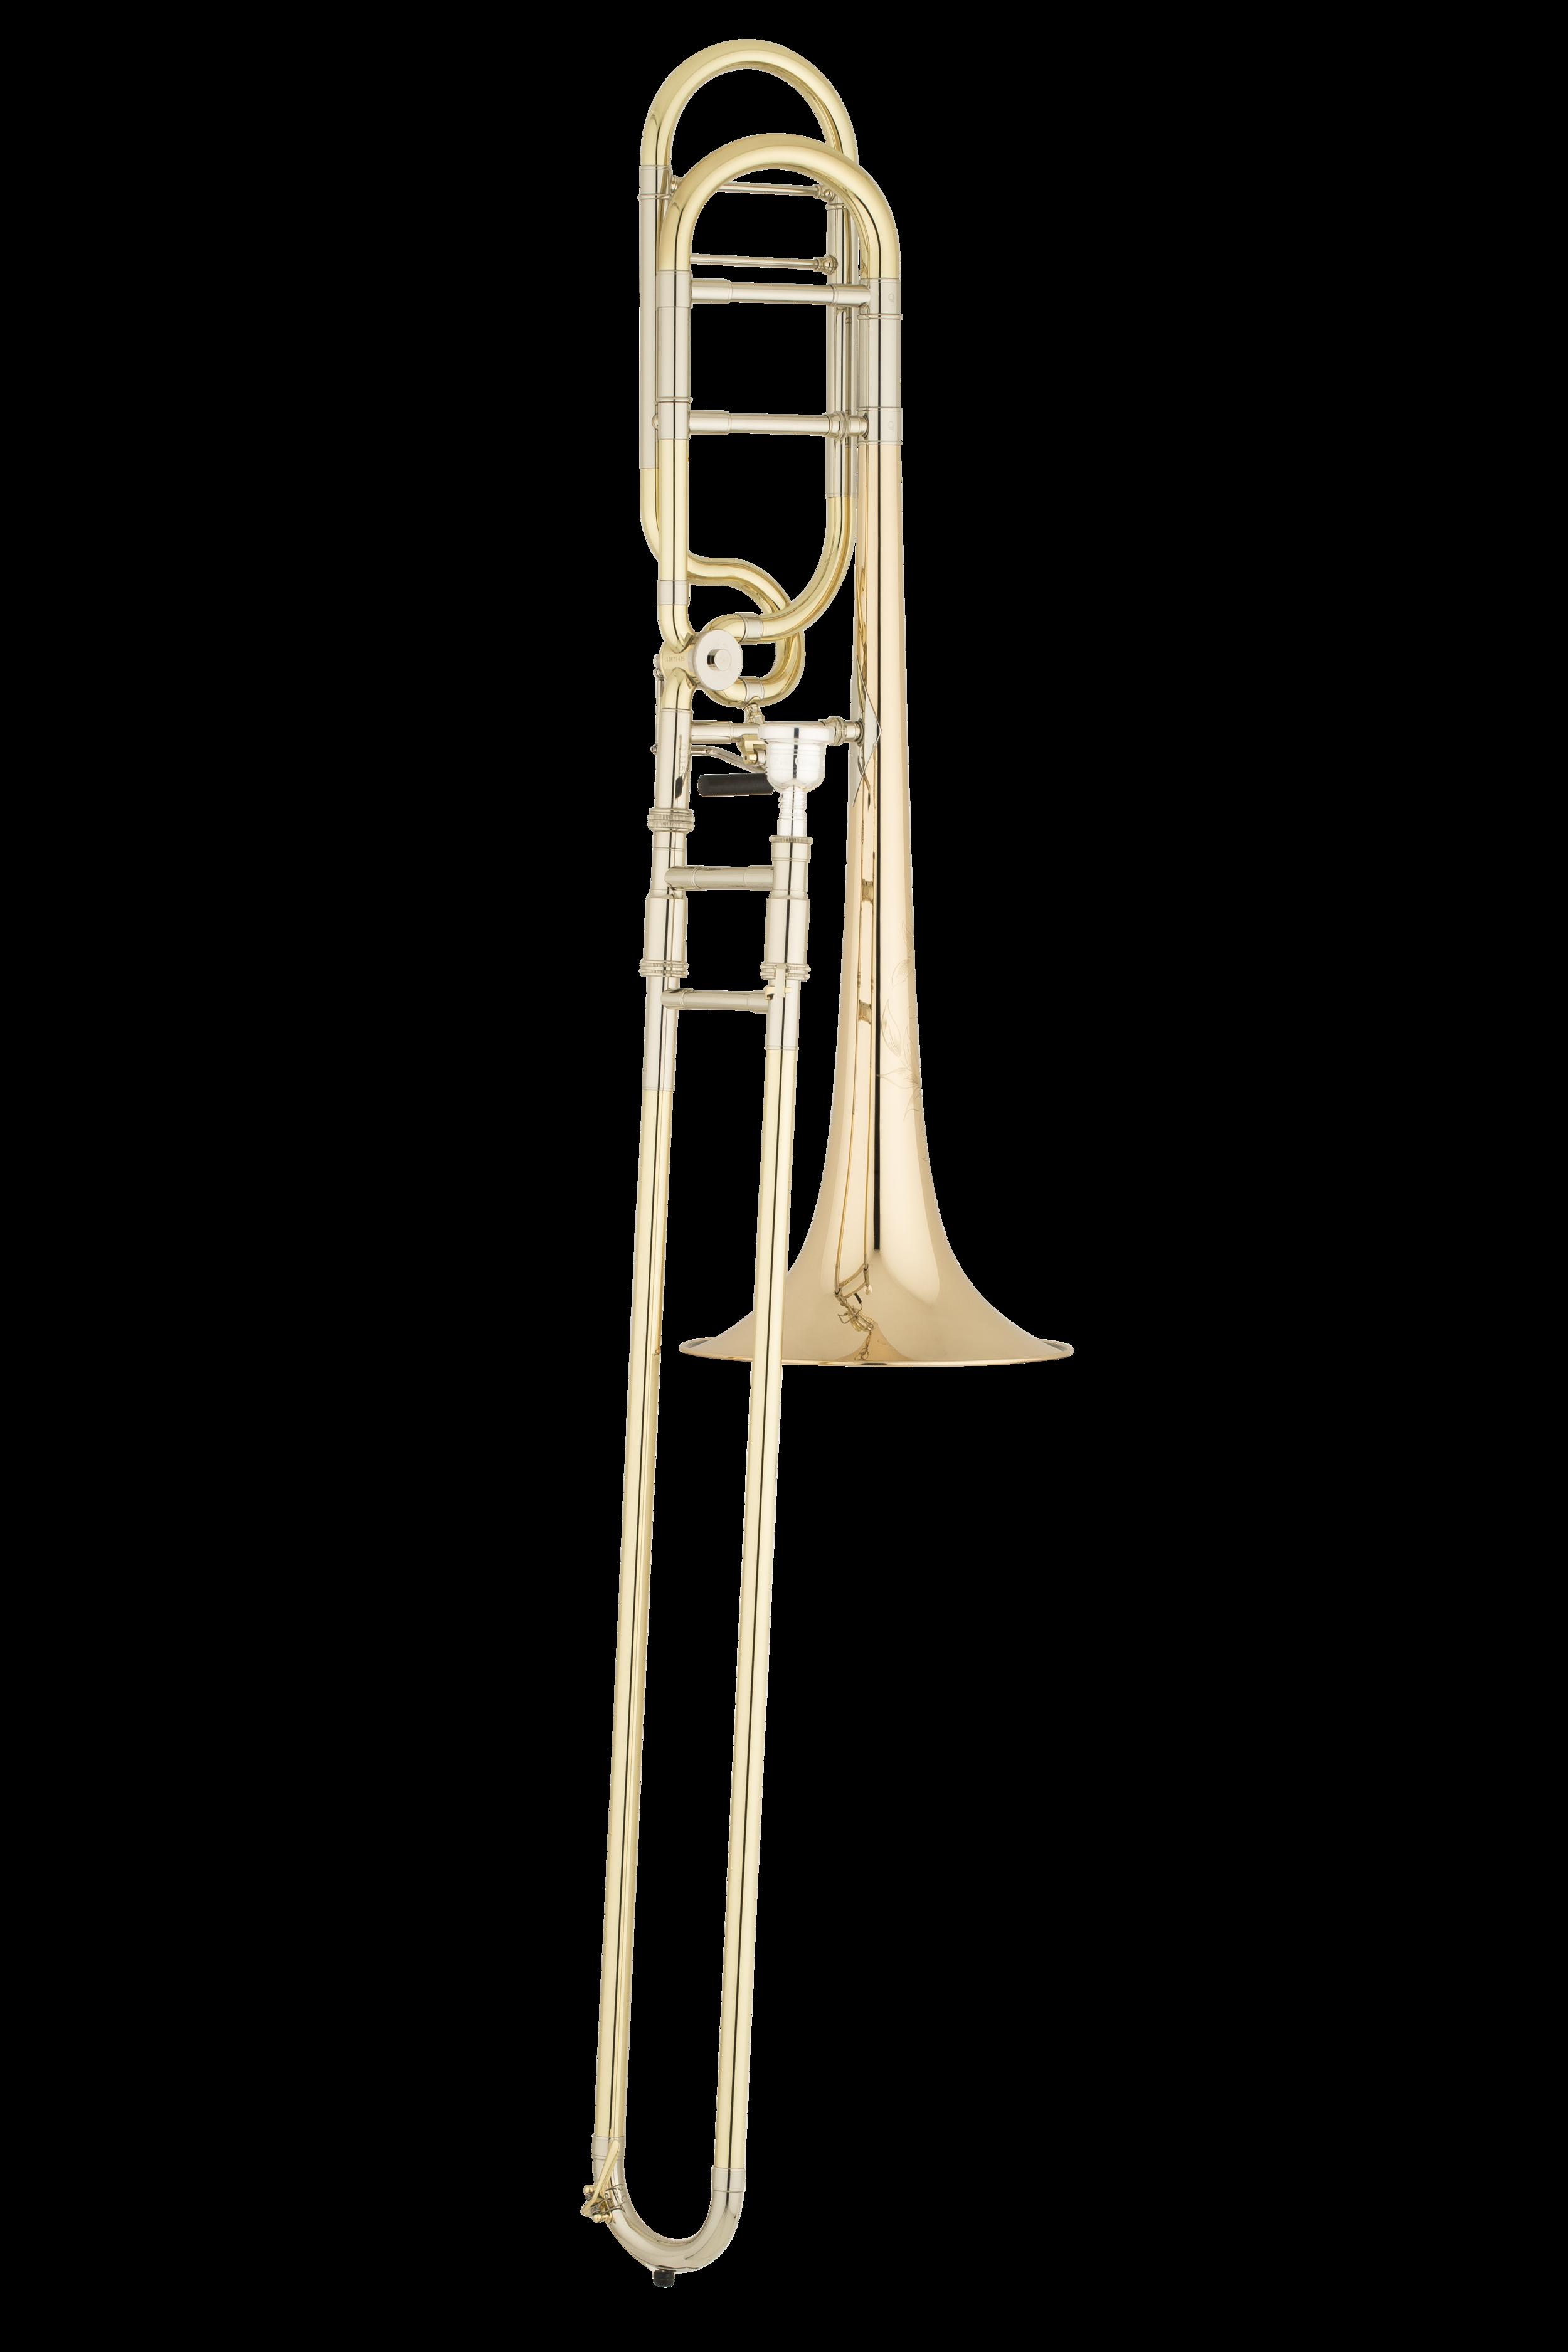 Shires_Trombone_TBQ30GR_Front_0718.png